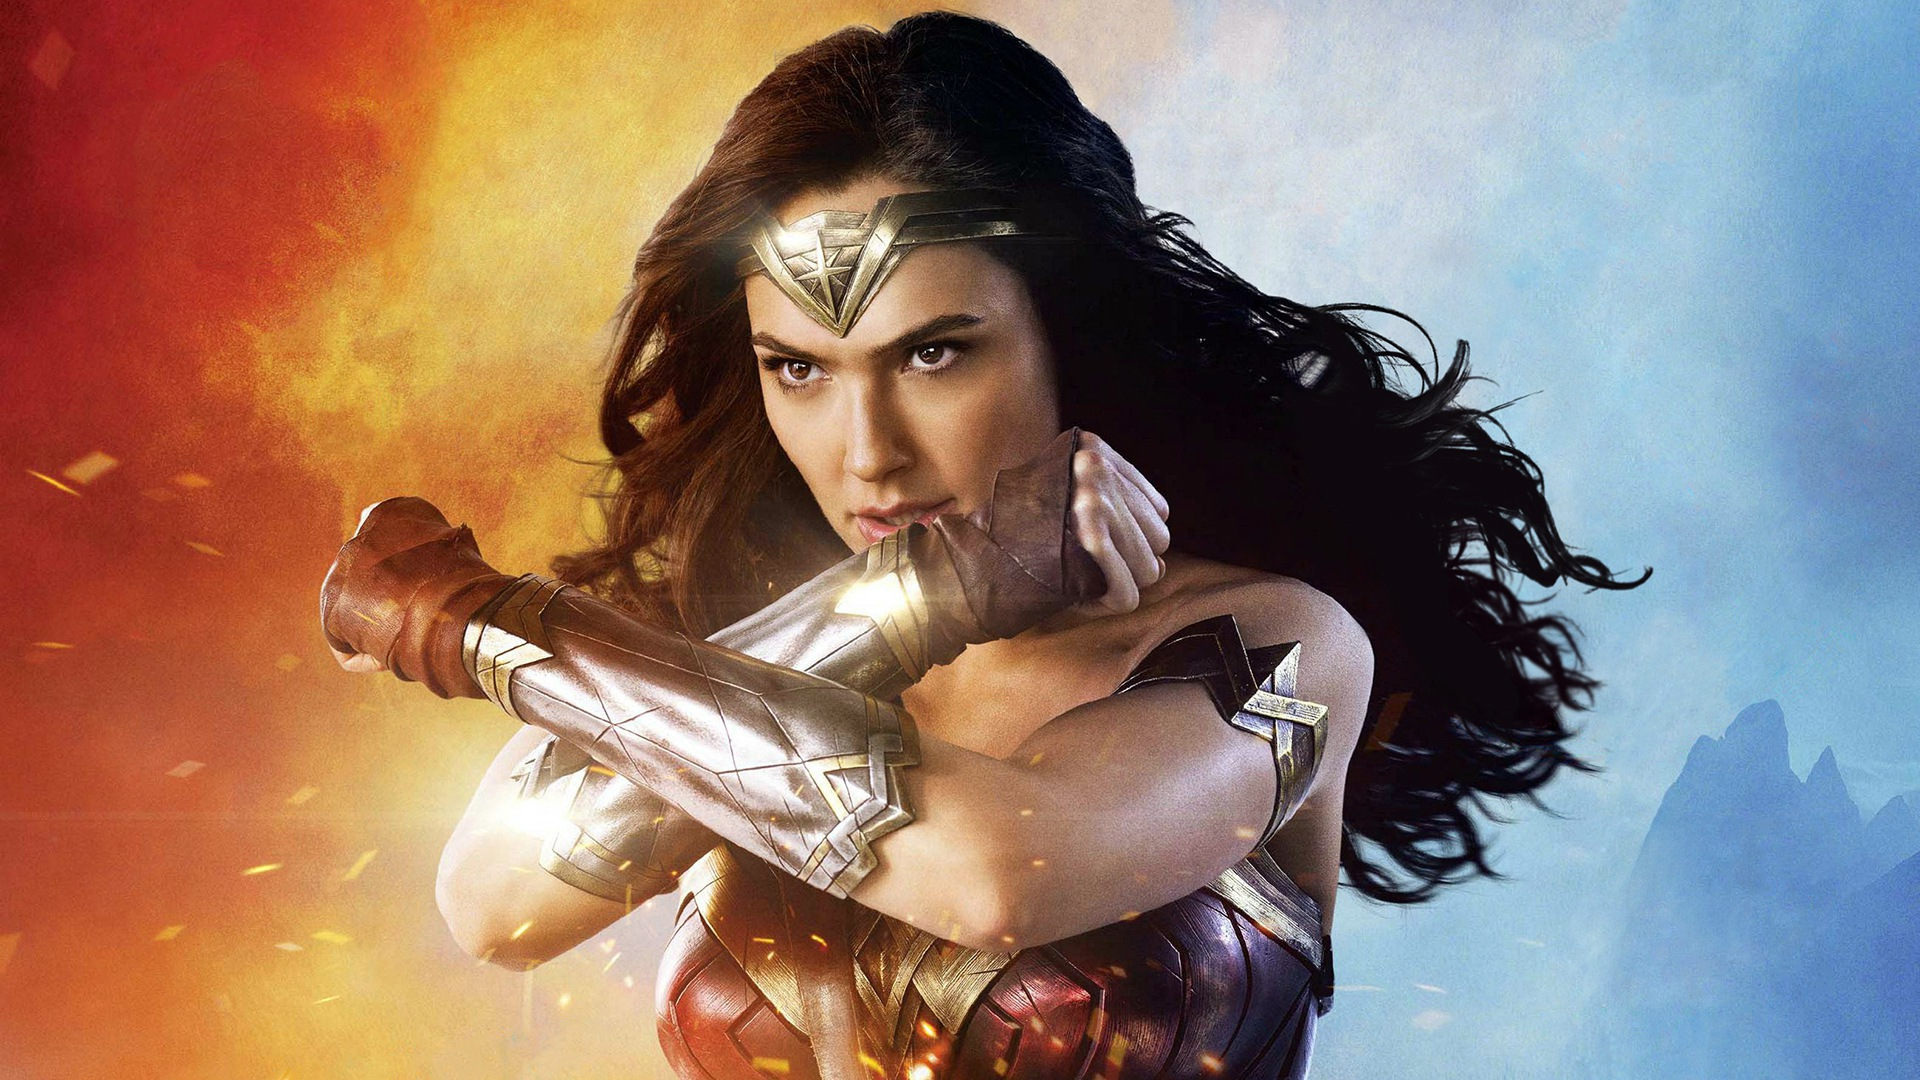 Wonder Woman 2017 3D BluRay 1080p AVC Atmos TrueHD7.1-CHDBits ~ Nữ Thần Chiến Binh